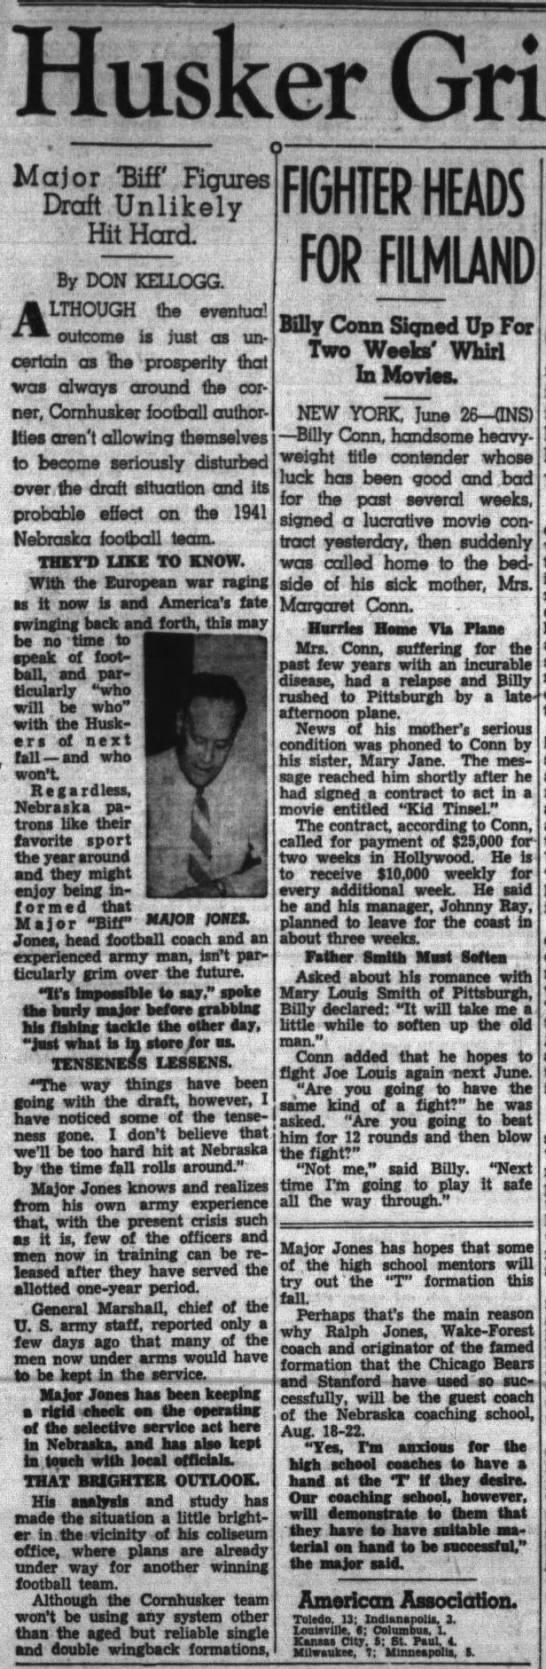 1941 Nebraska football and military draft -